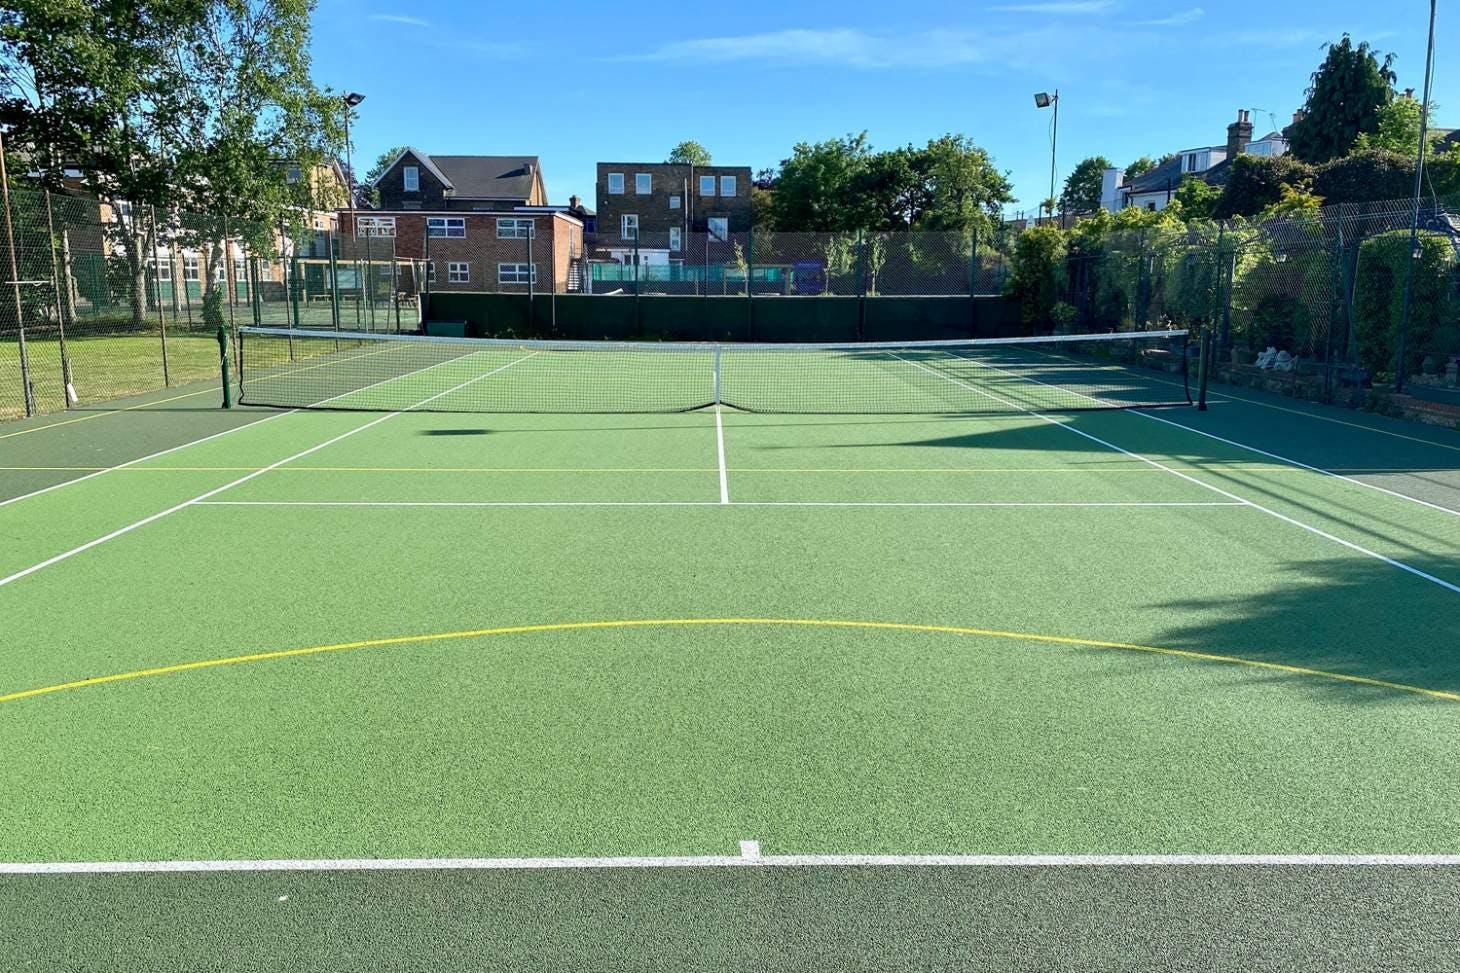 Blackheath Wanderers Sports Club Outdoor | Hard (macadam) tennis court